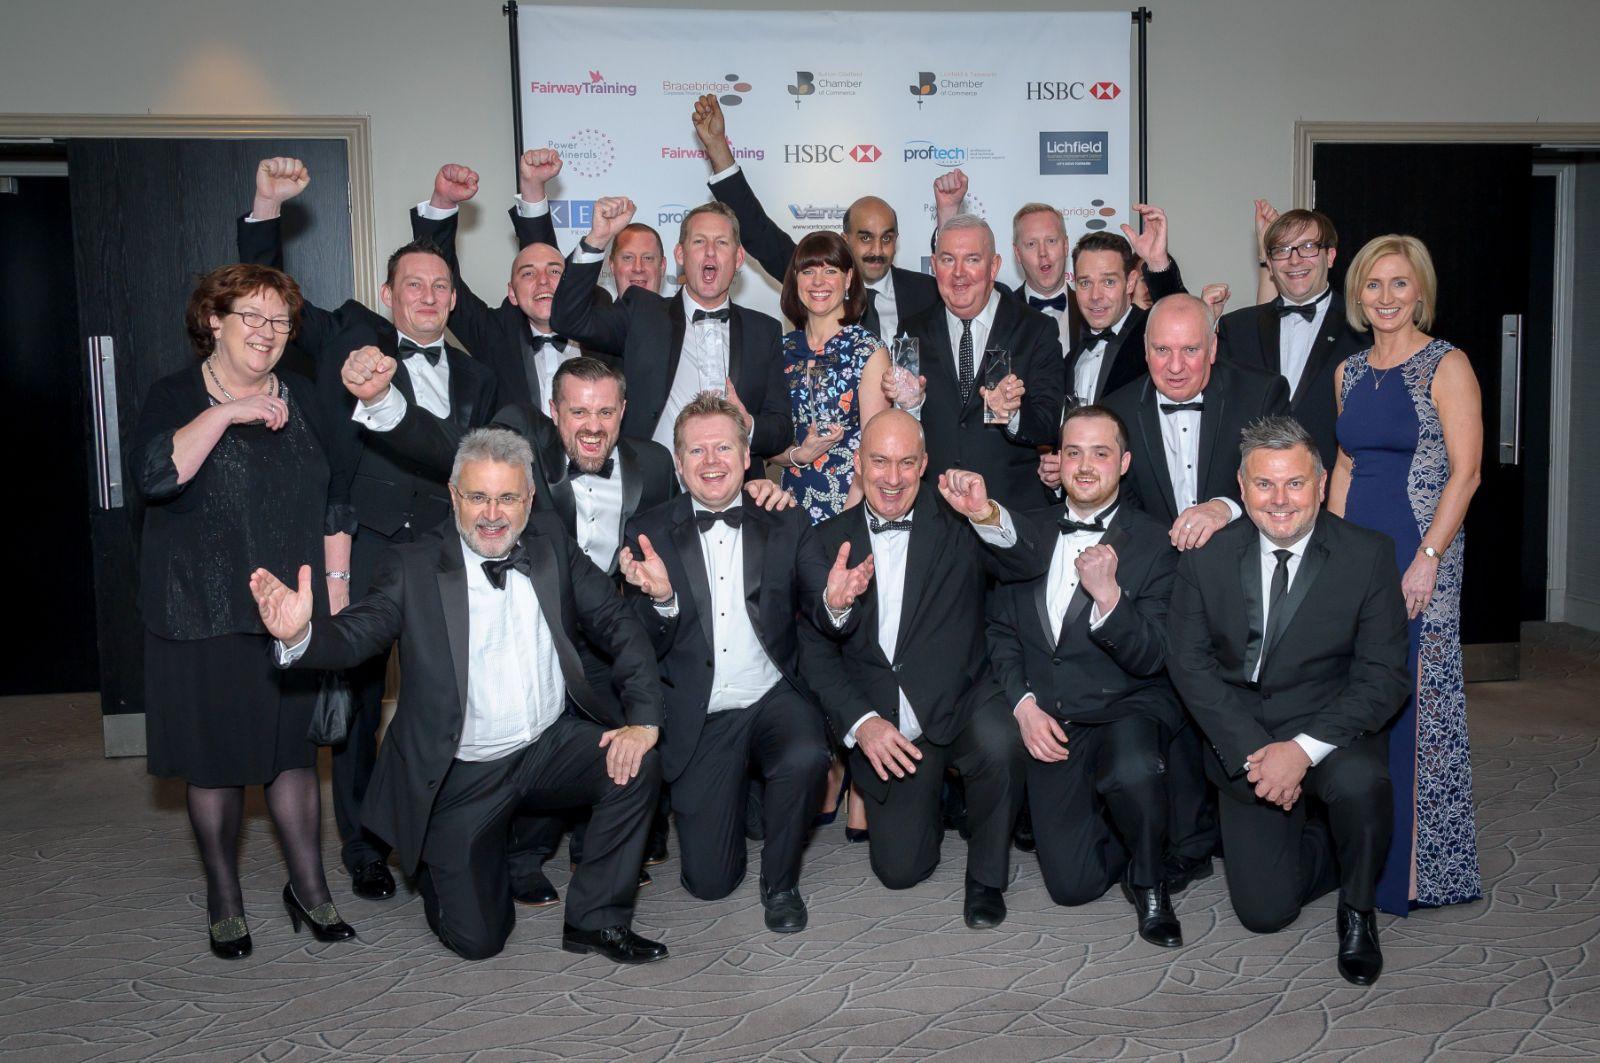 Lichfield & Tamworth Chamber President's Award 2018 - Wagstaff